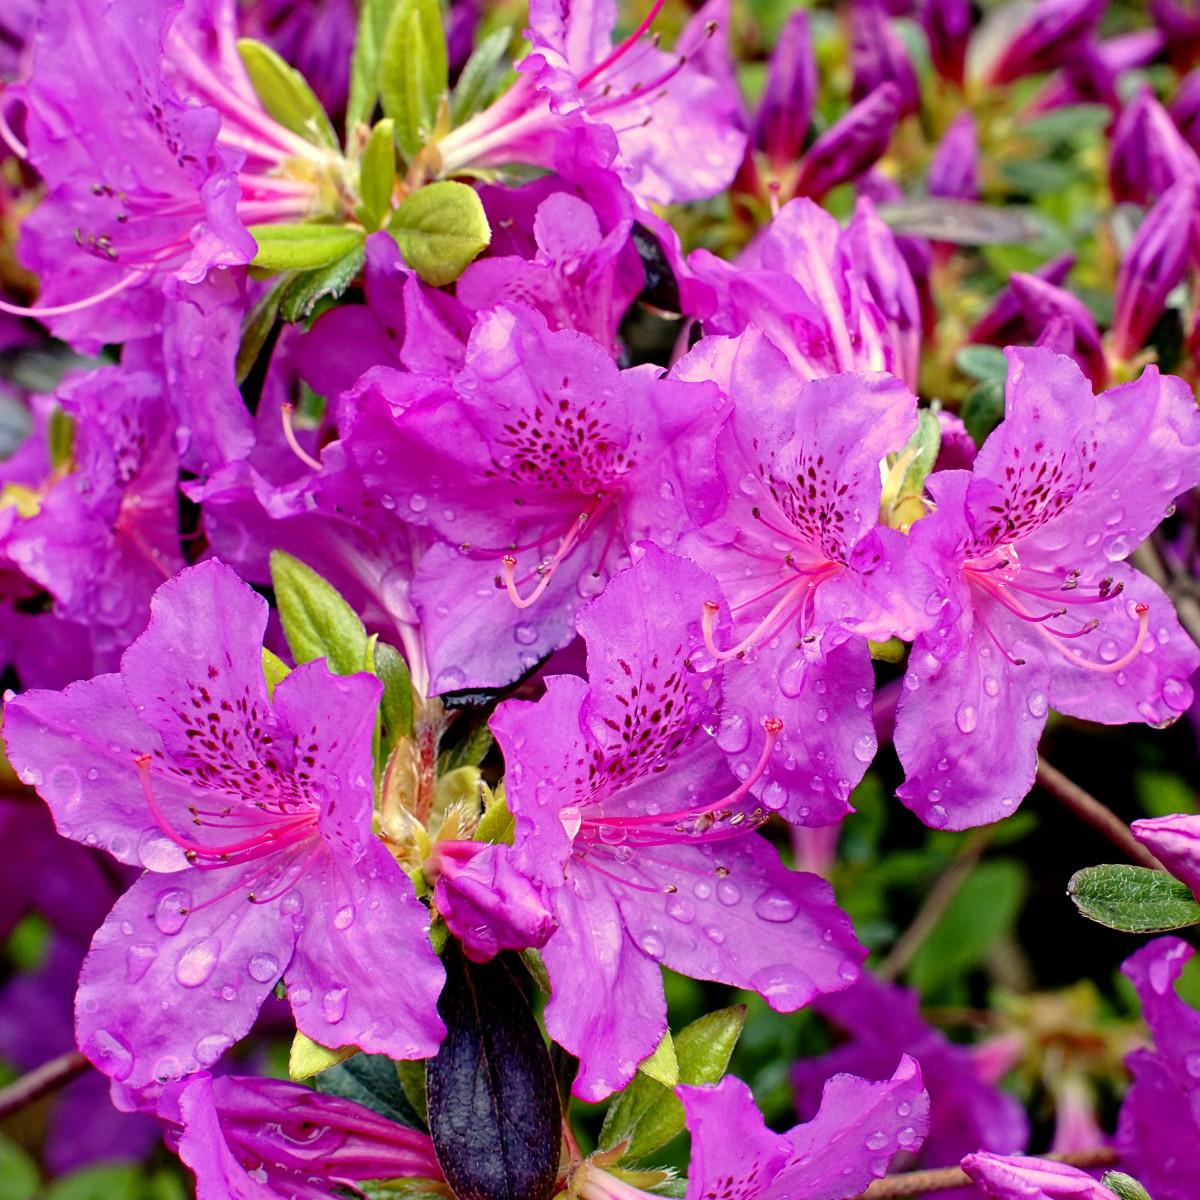 Azalea Shrub Flowers